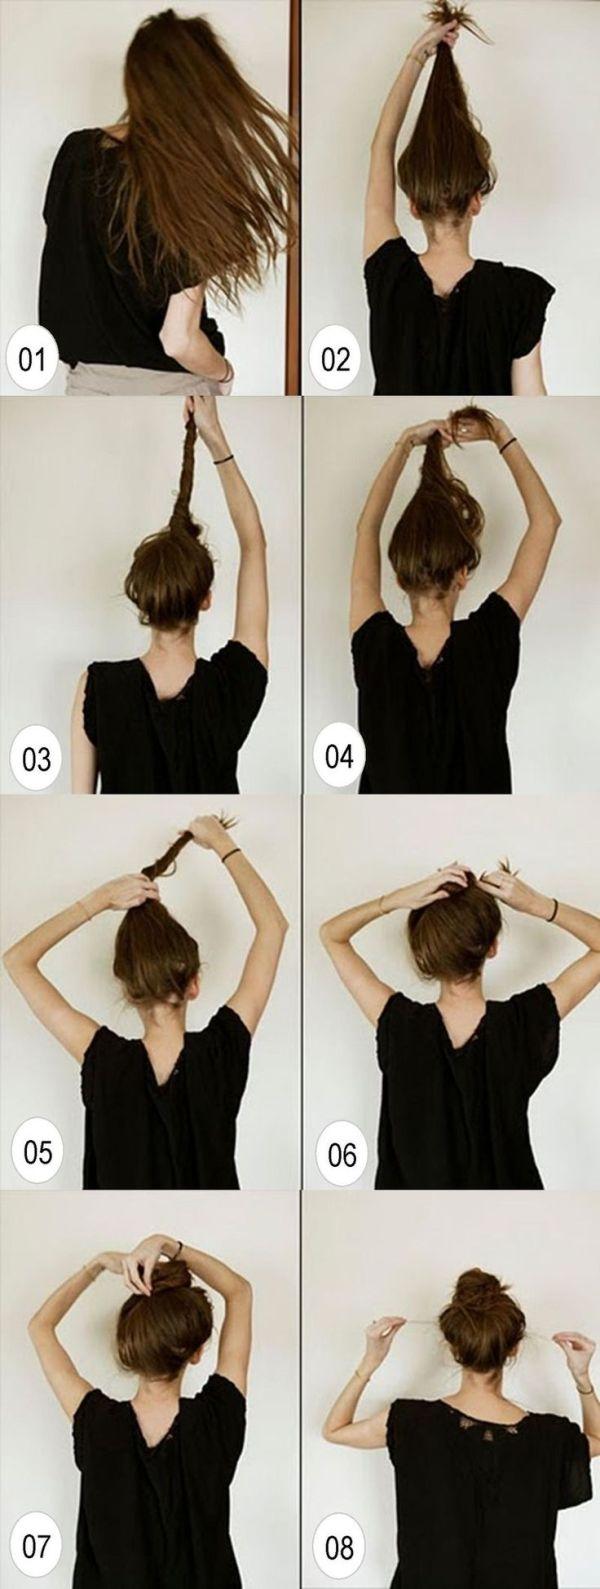 How to make a perfect messy bun by latasha